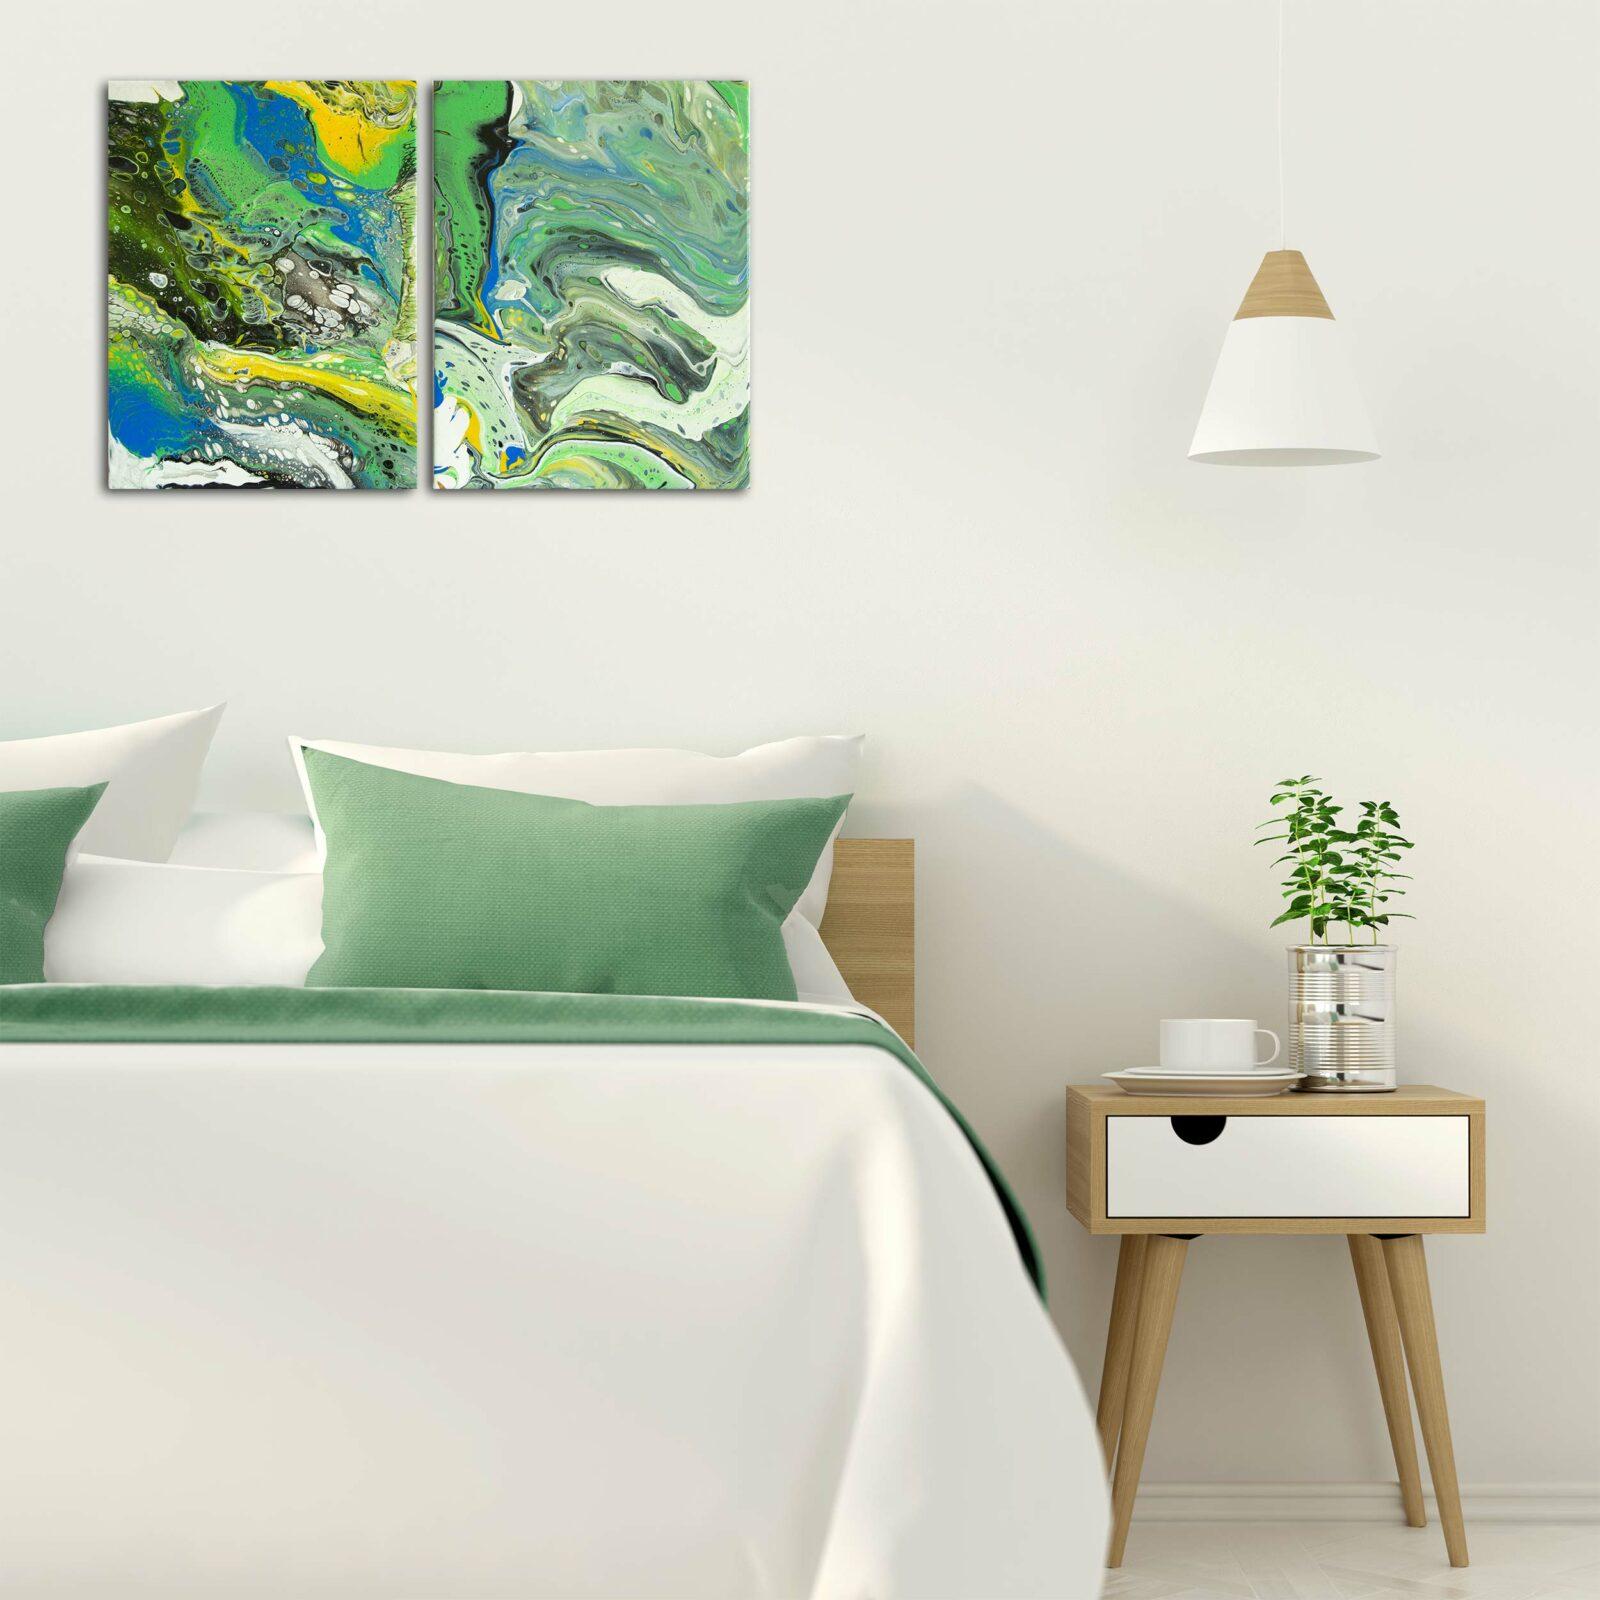 "Wandbild 2er Stet: Acryl Pouring Painting ""Green & Blue"" Unikat (149)"